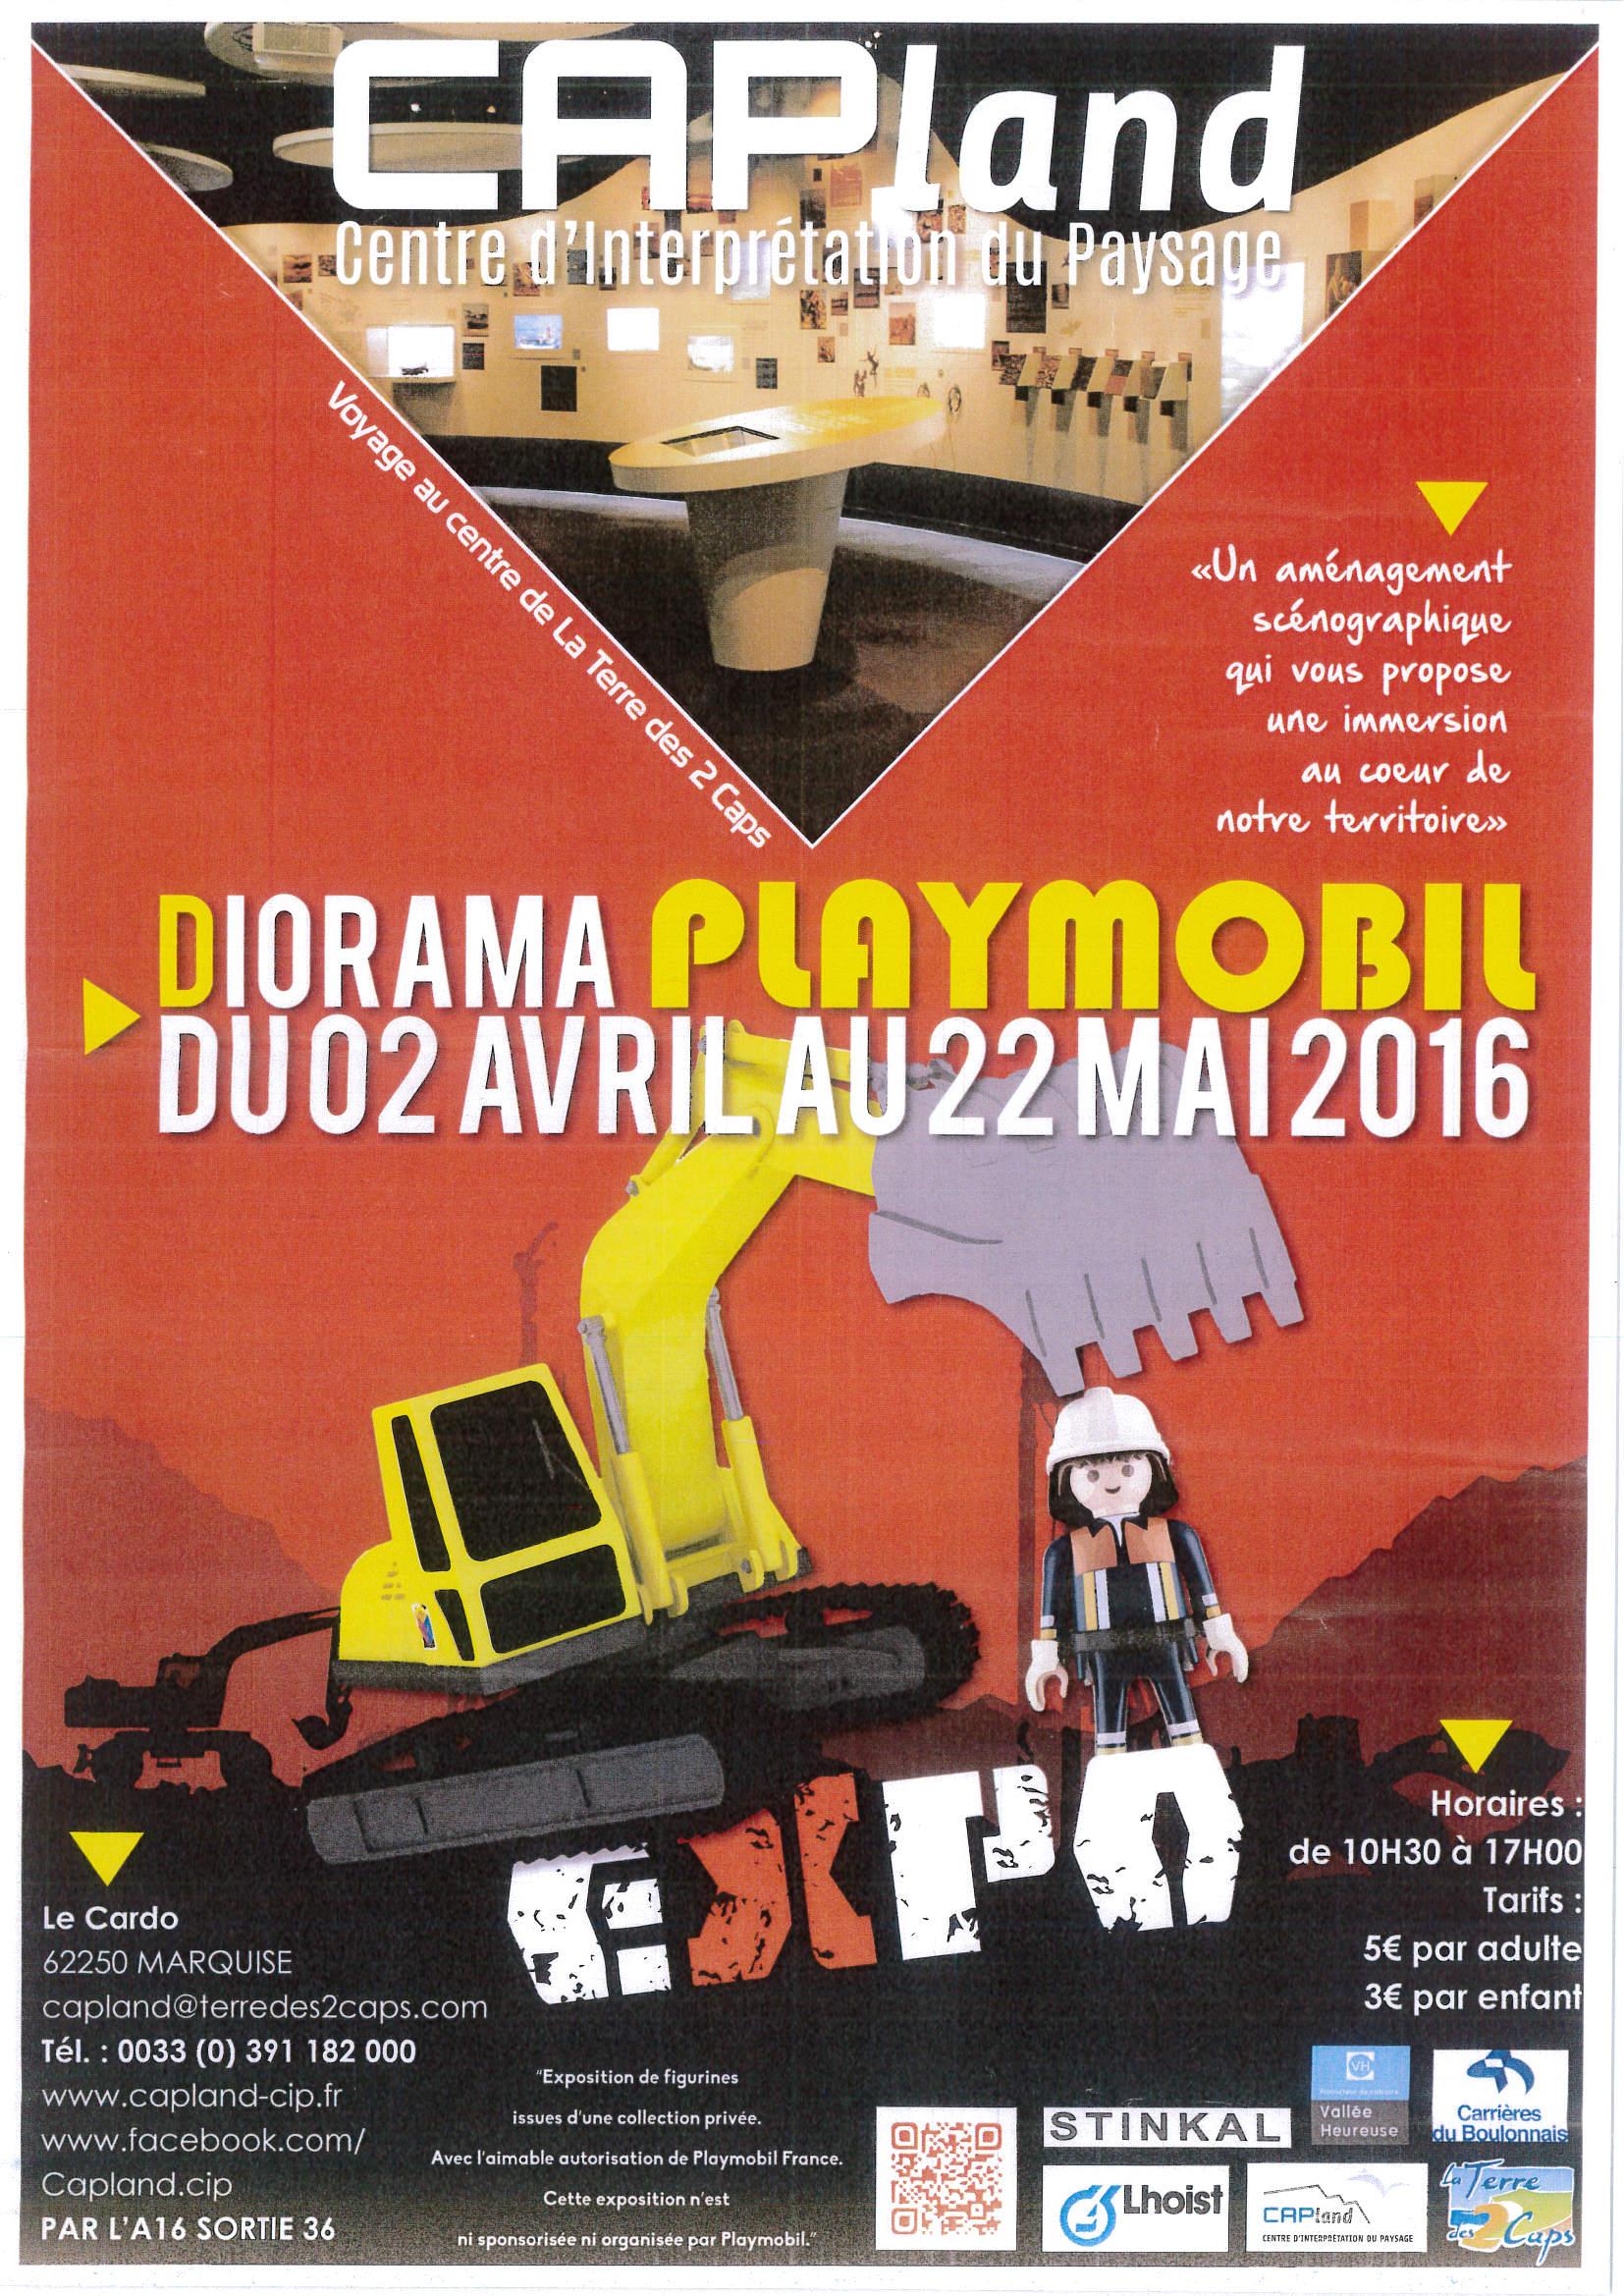 playmobil_001.jpg